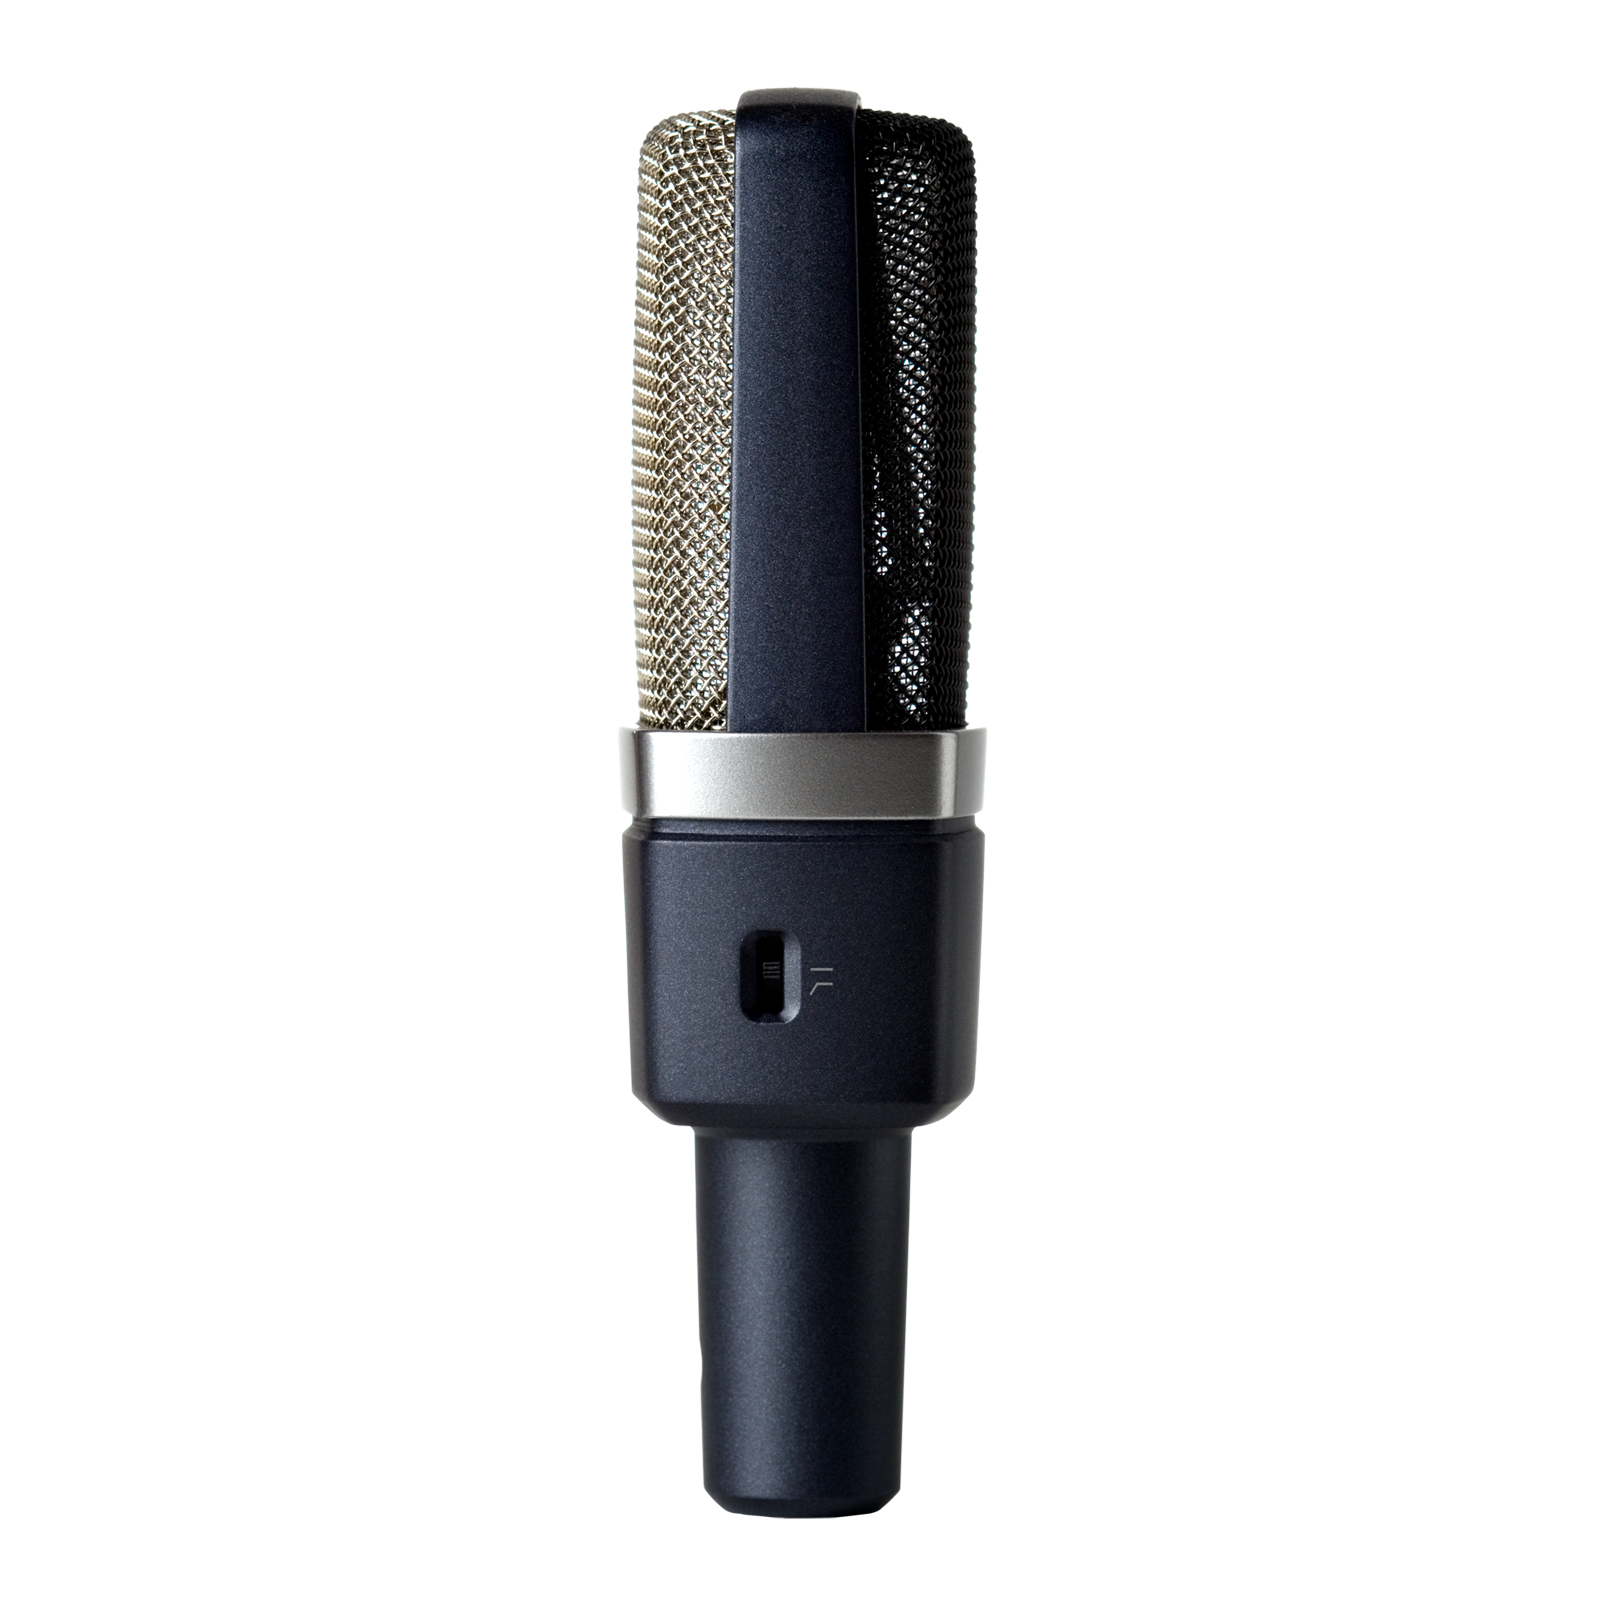 C214 - Black - Professional  large-diaphragm  condenser microphone - Left